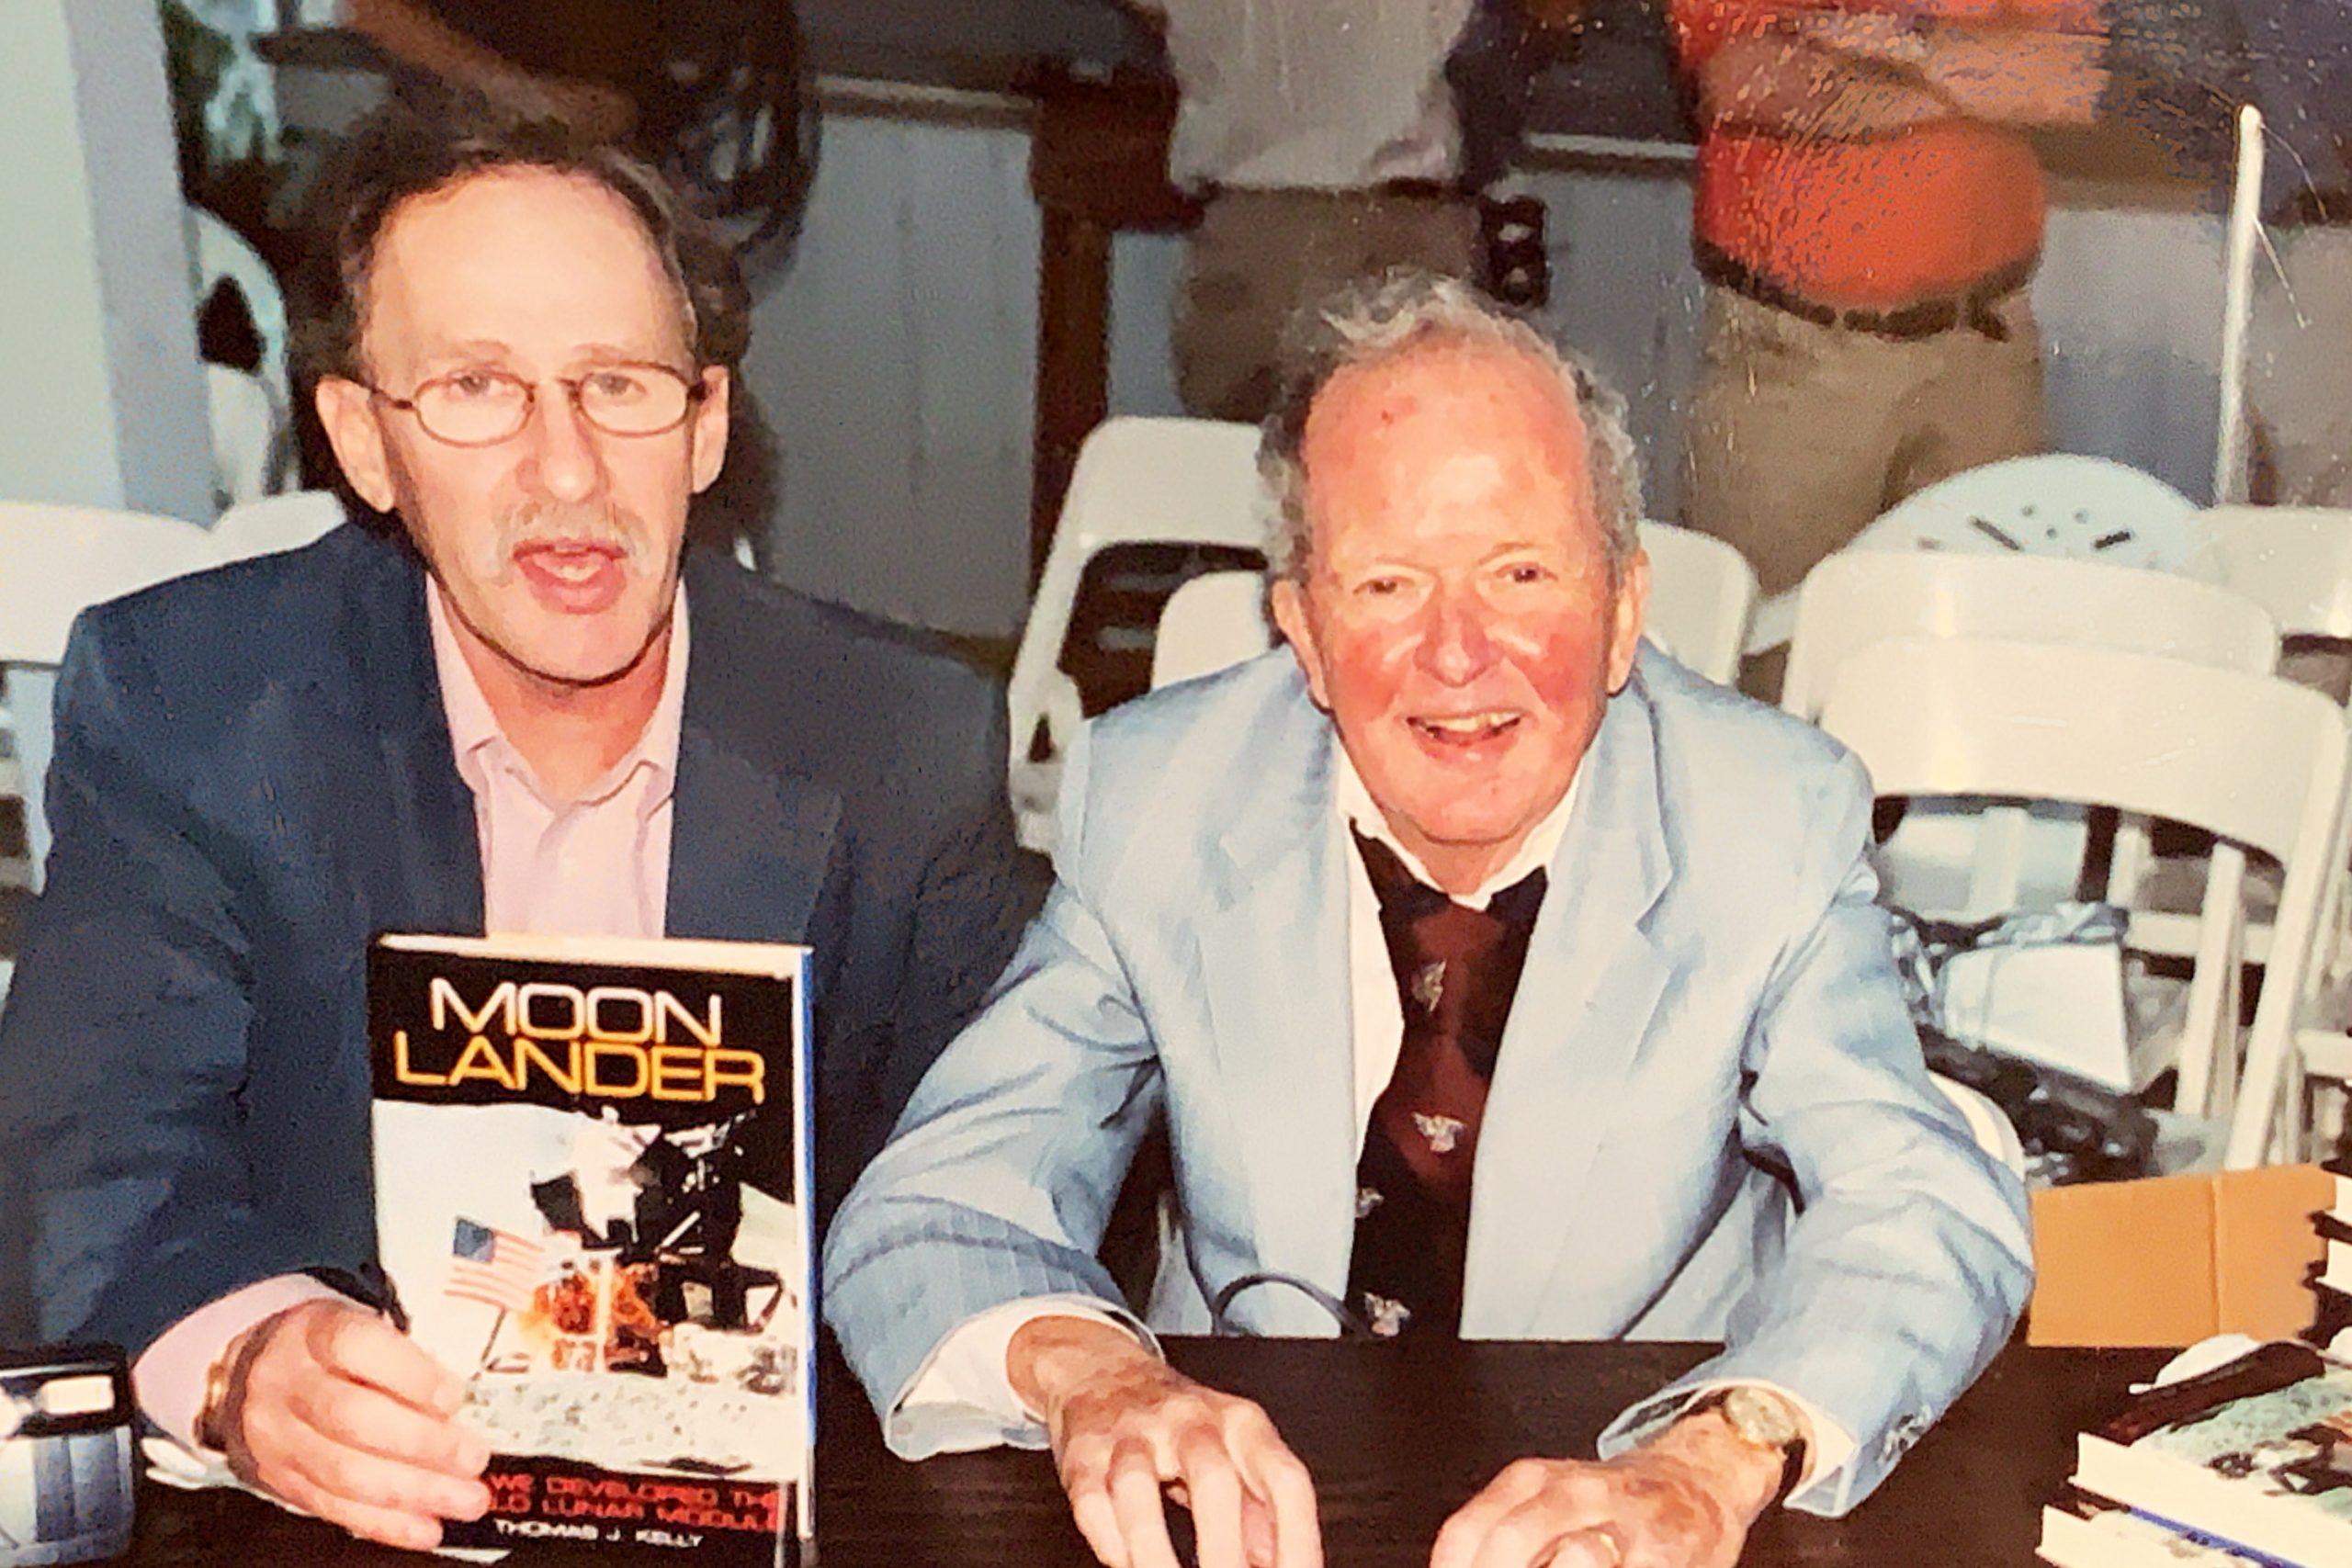 "Thomas J. Kelly, author of ""Moon Lander"""